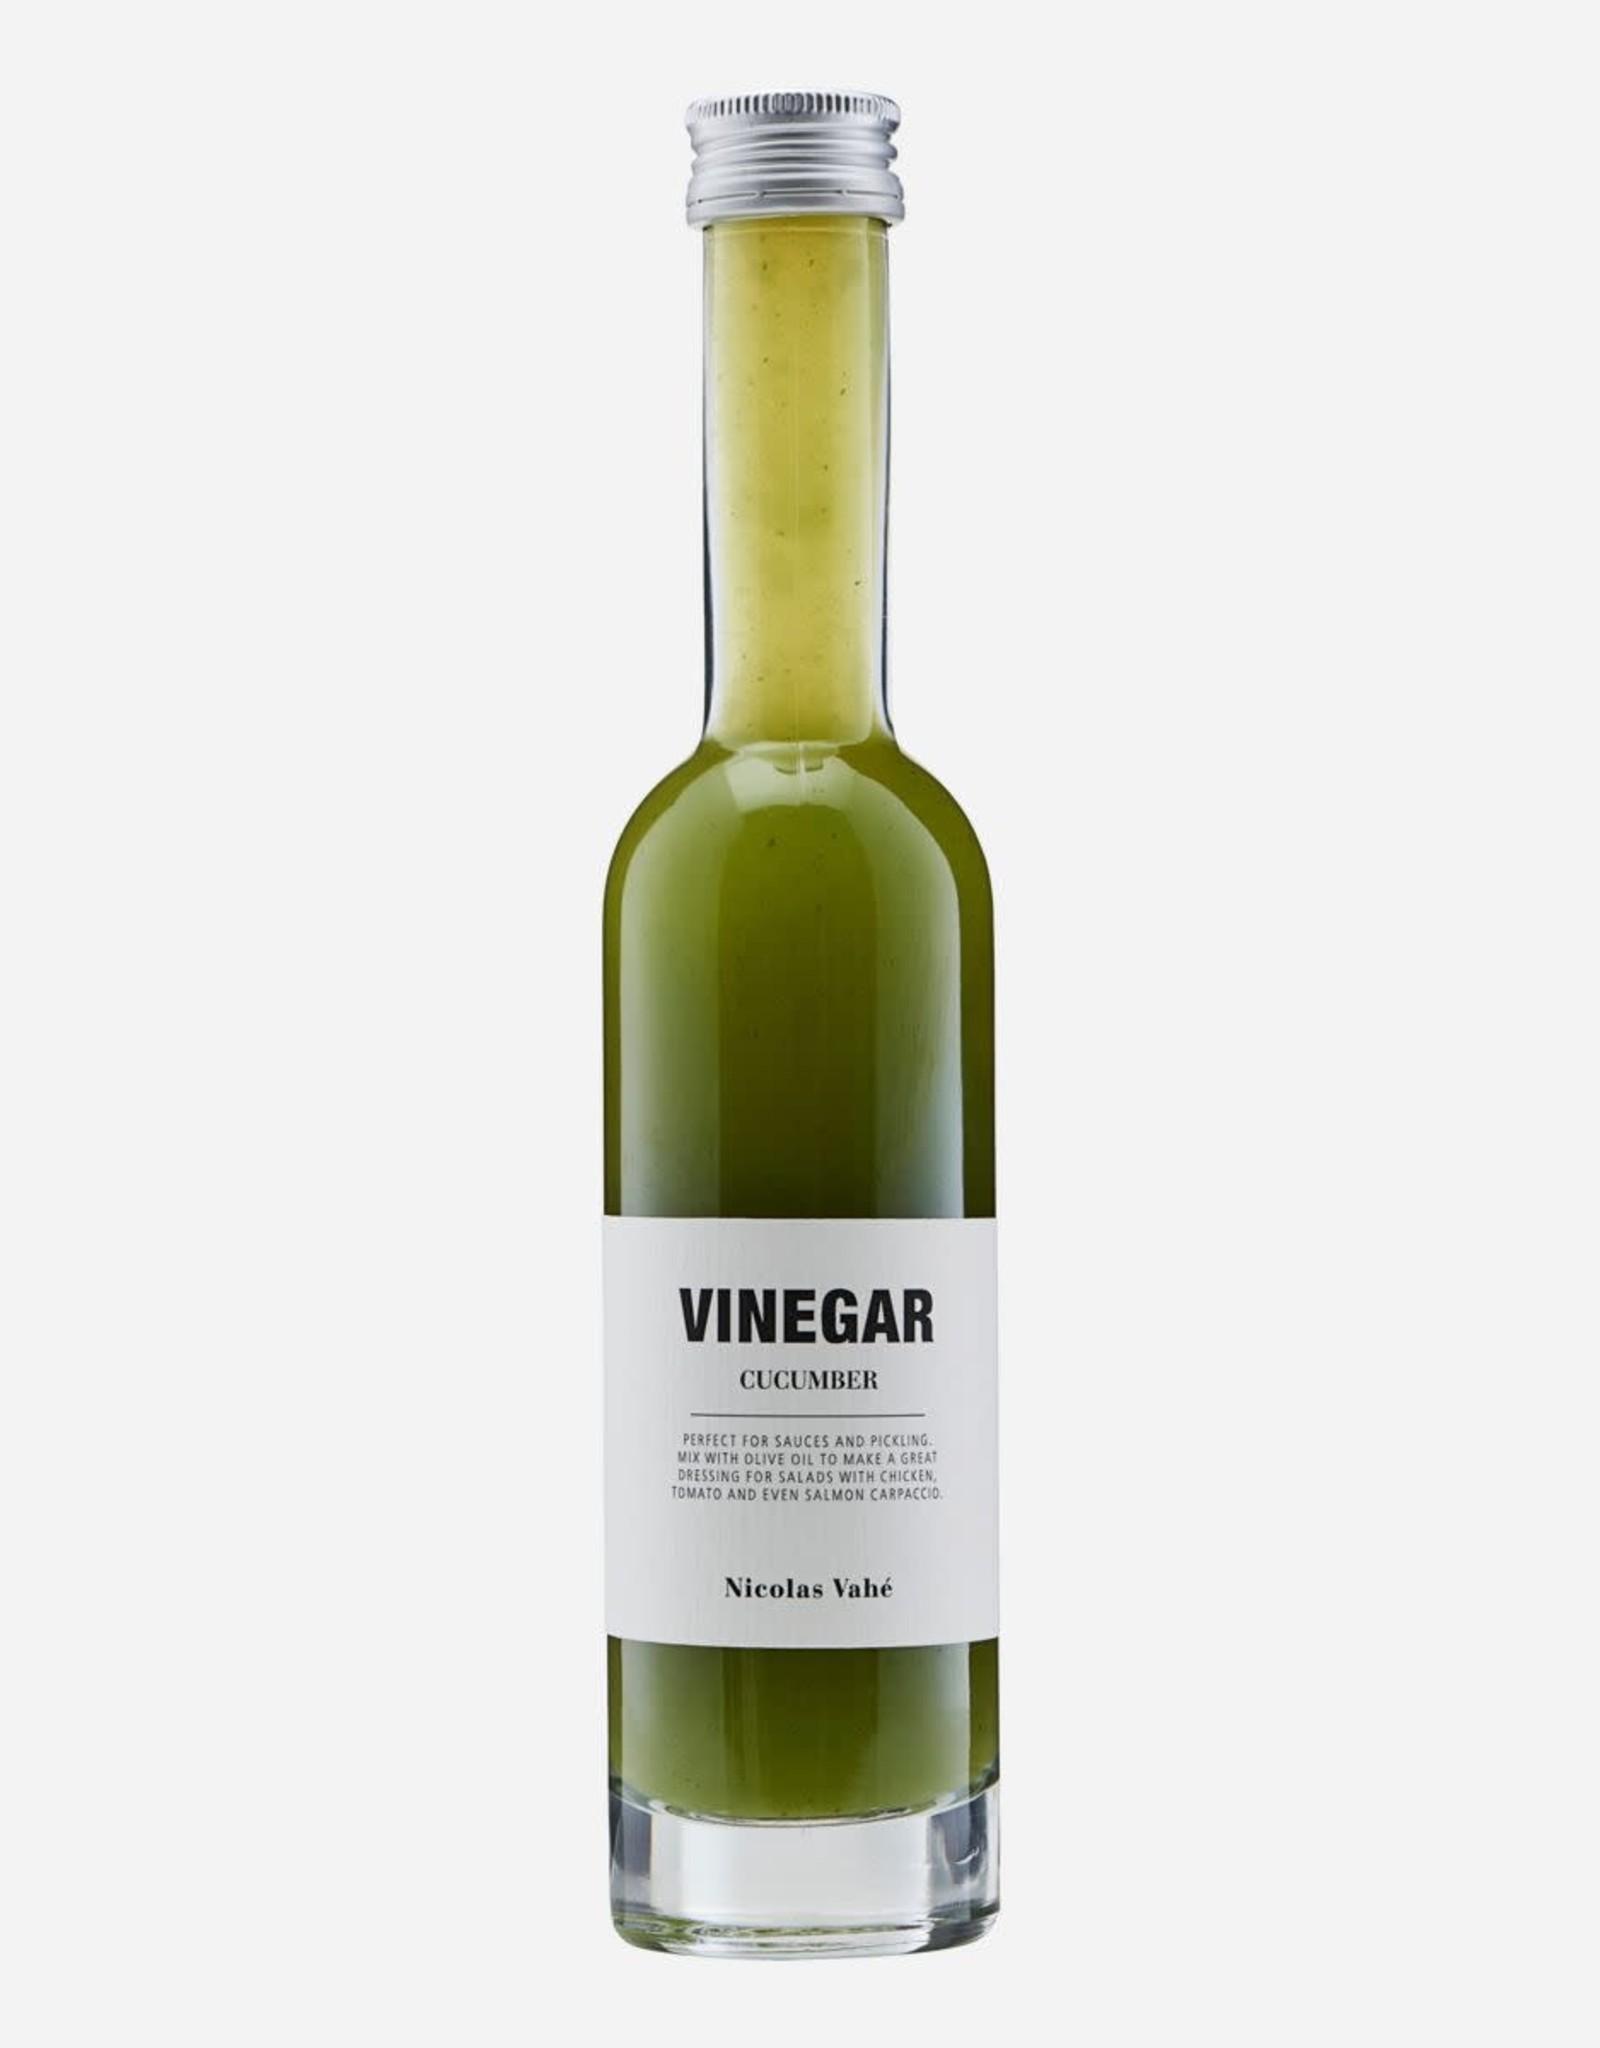 Nicolas Vahé Nicolas Vahé Vinegar Cucumber